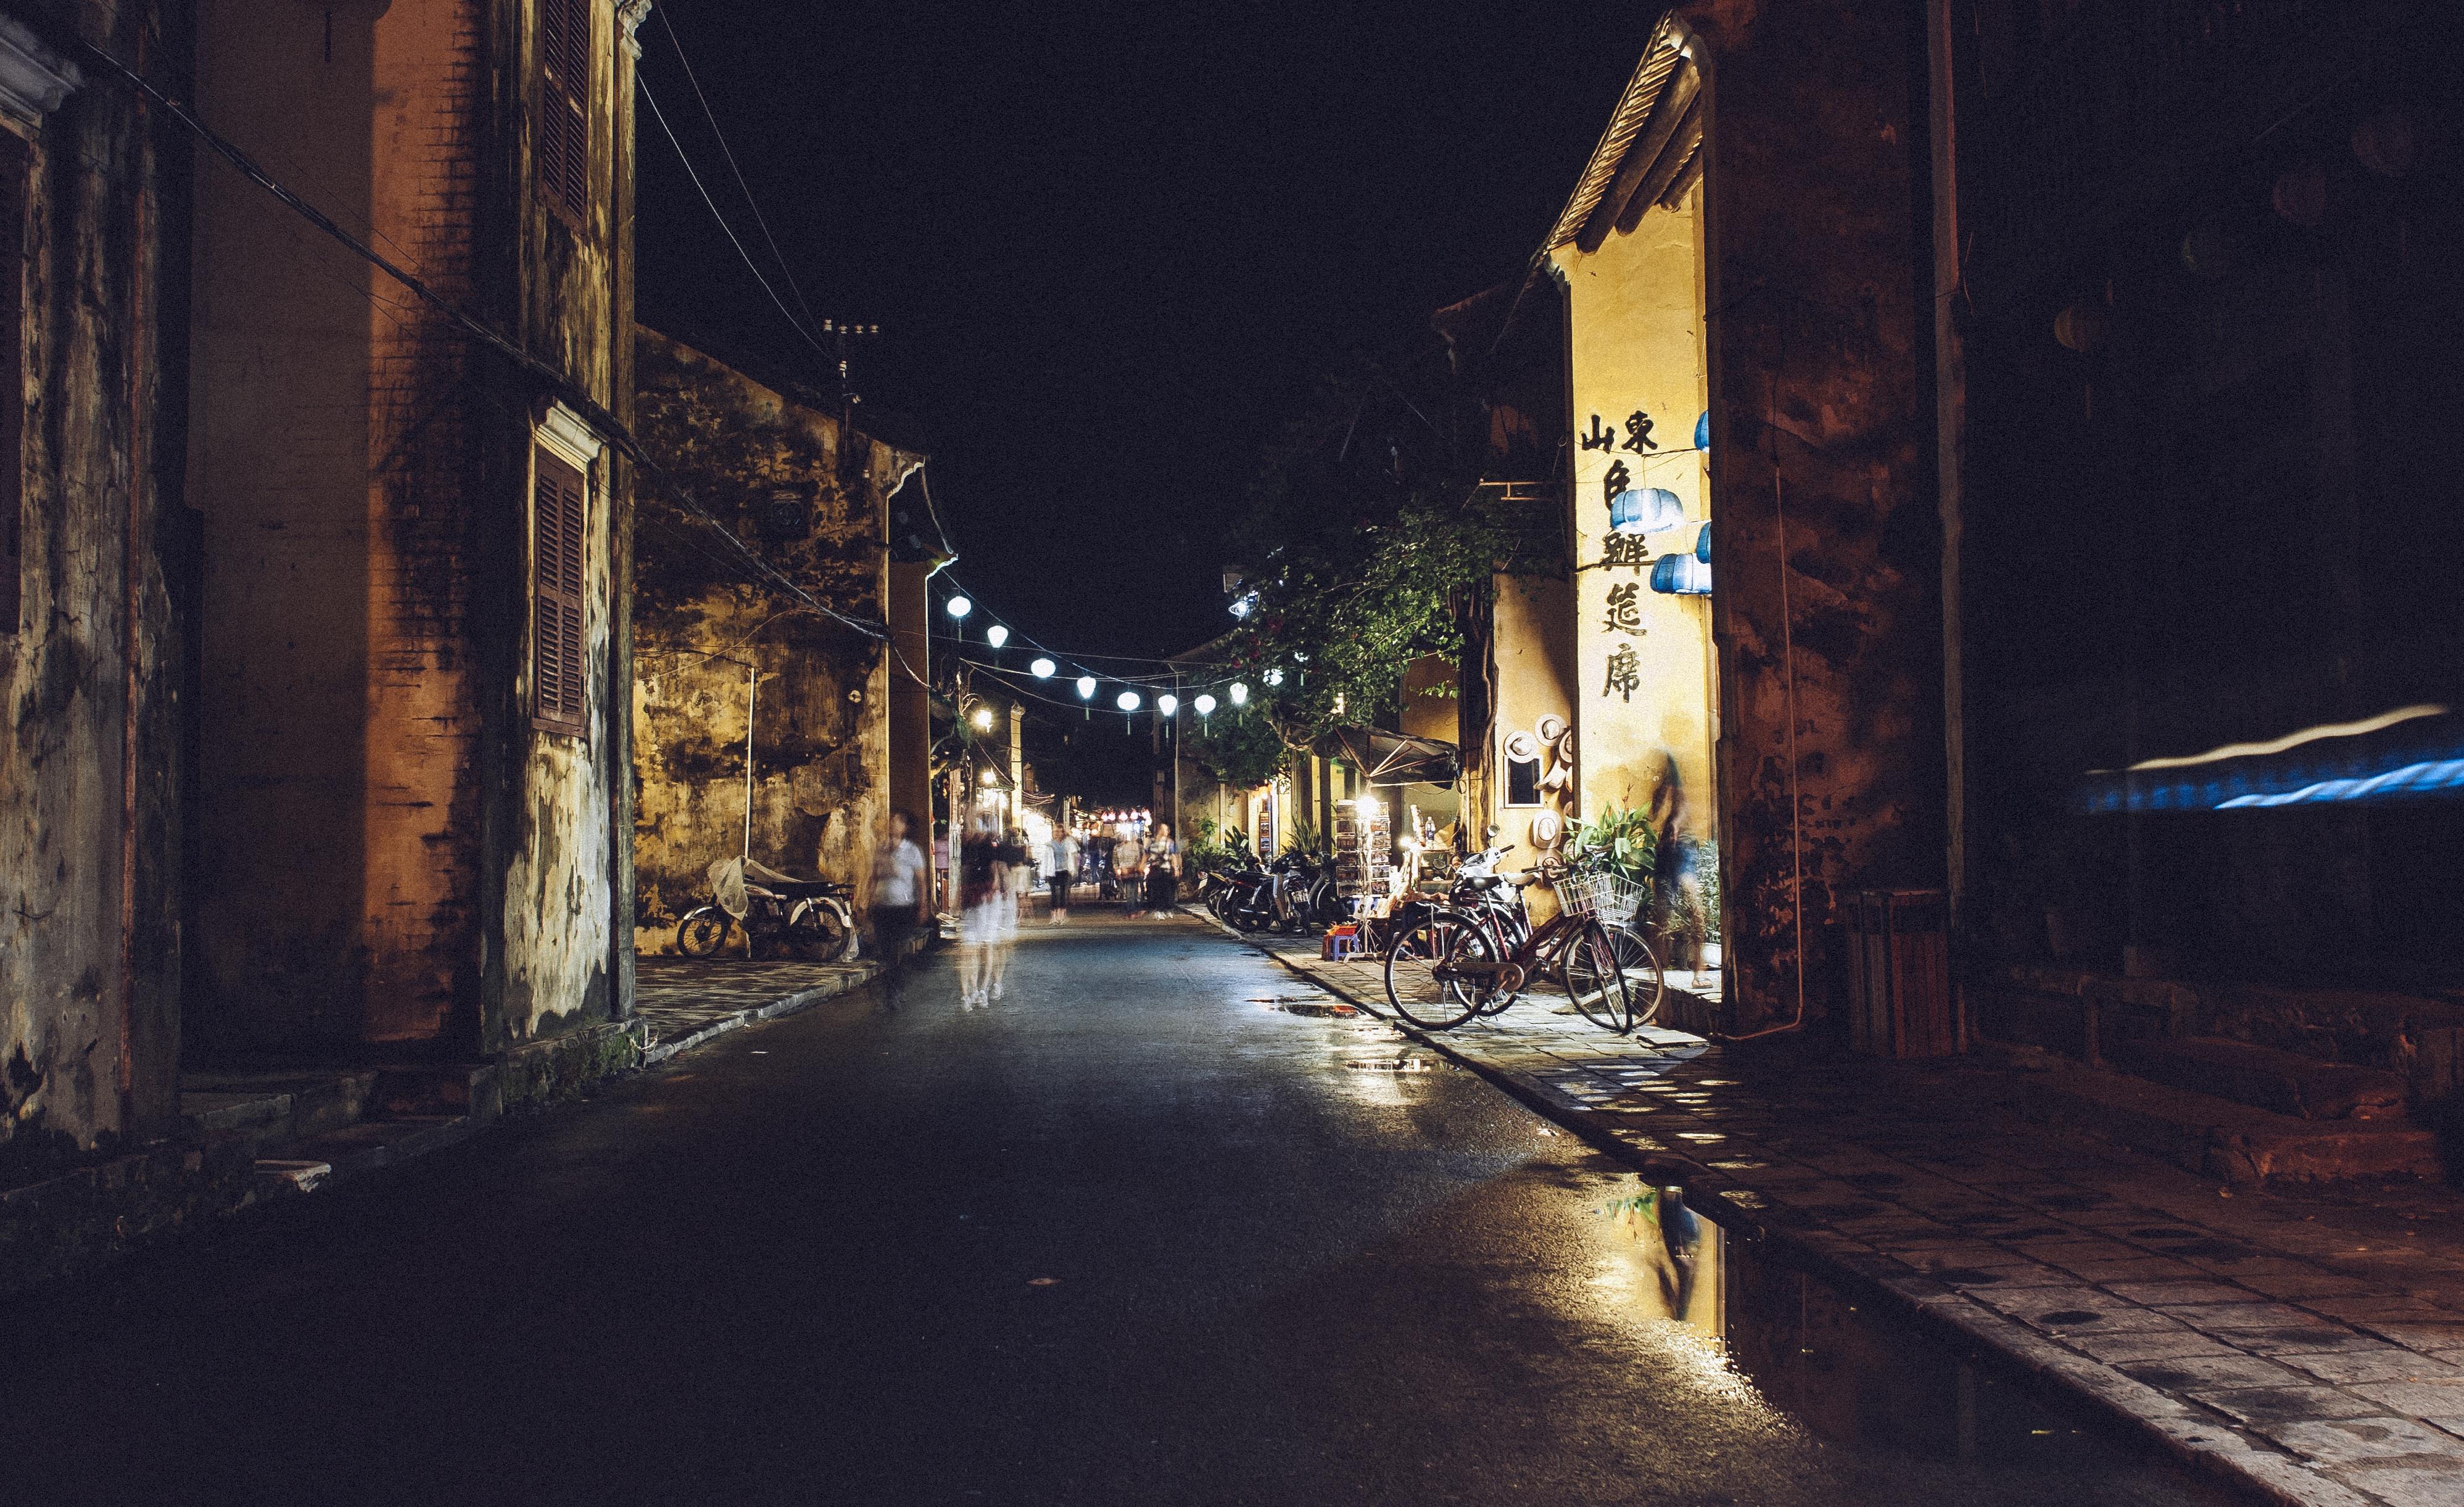 Night life photo